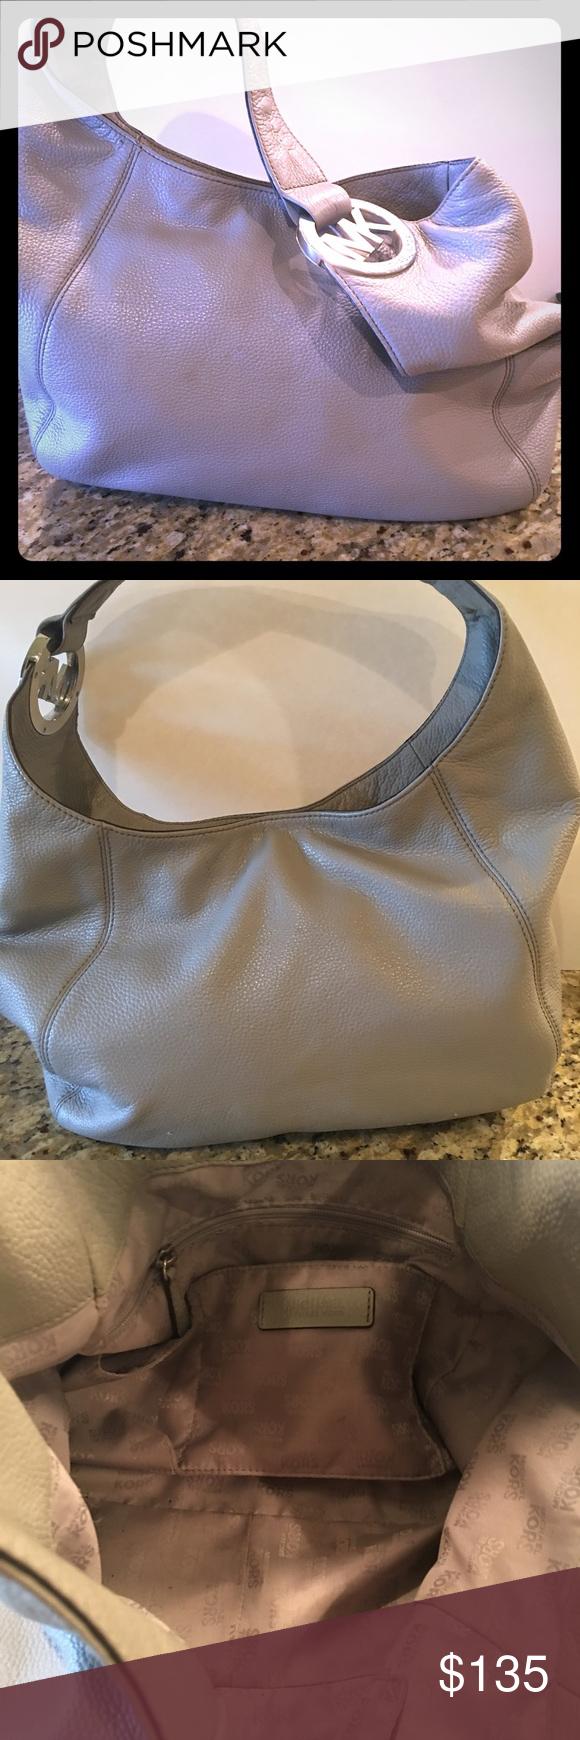 Michael Kors Hobo Handbag Beautiful gray Kors Hobo handbag! Color is versatile to carry year round! No visible flaws and has been treated with MK leather treatment. Michael Kors Bags Hobos